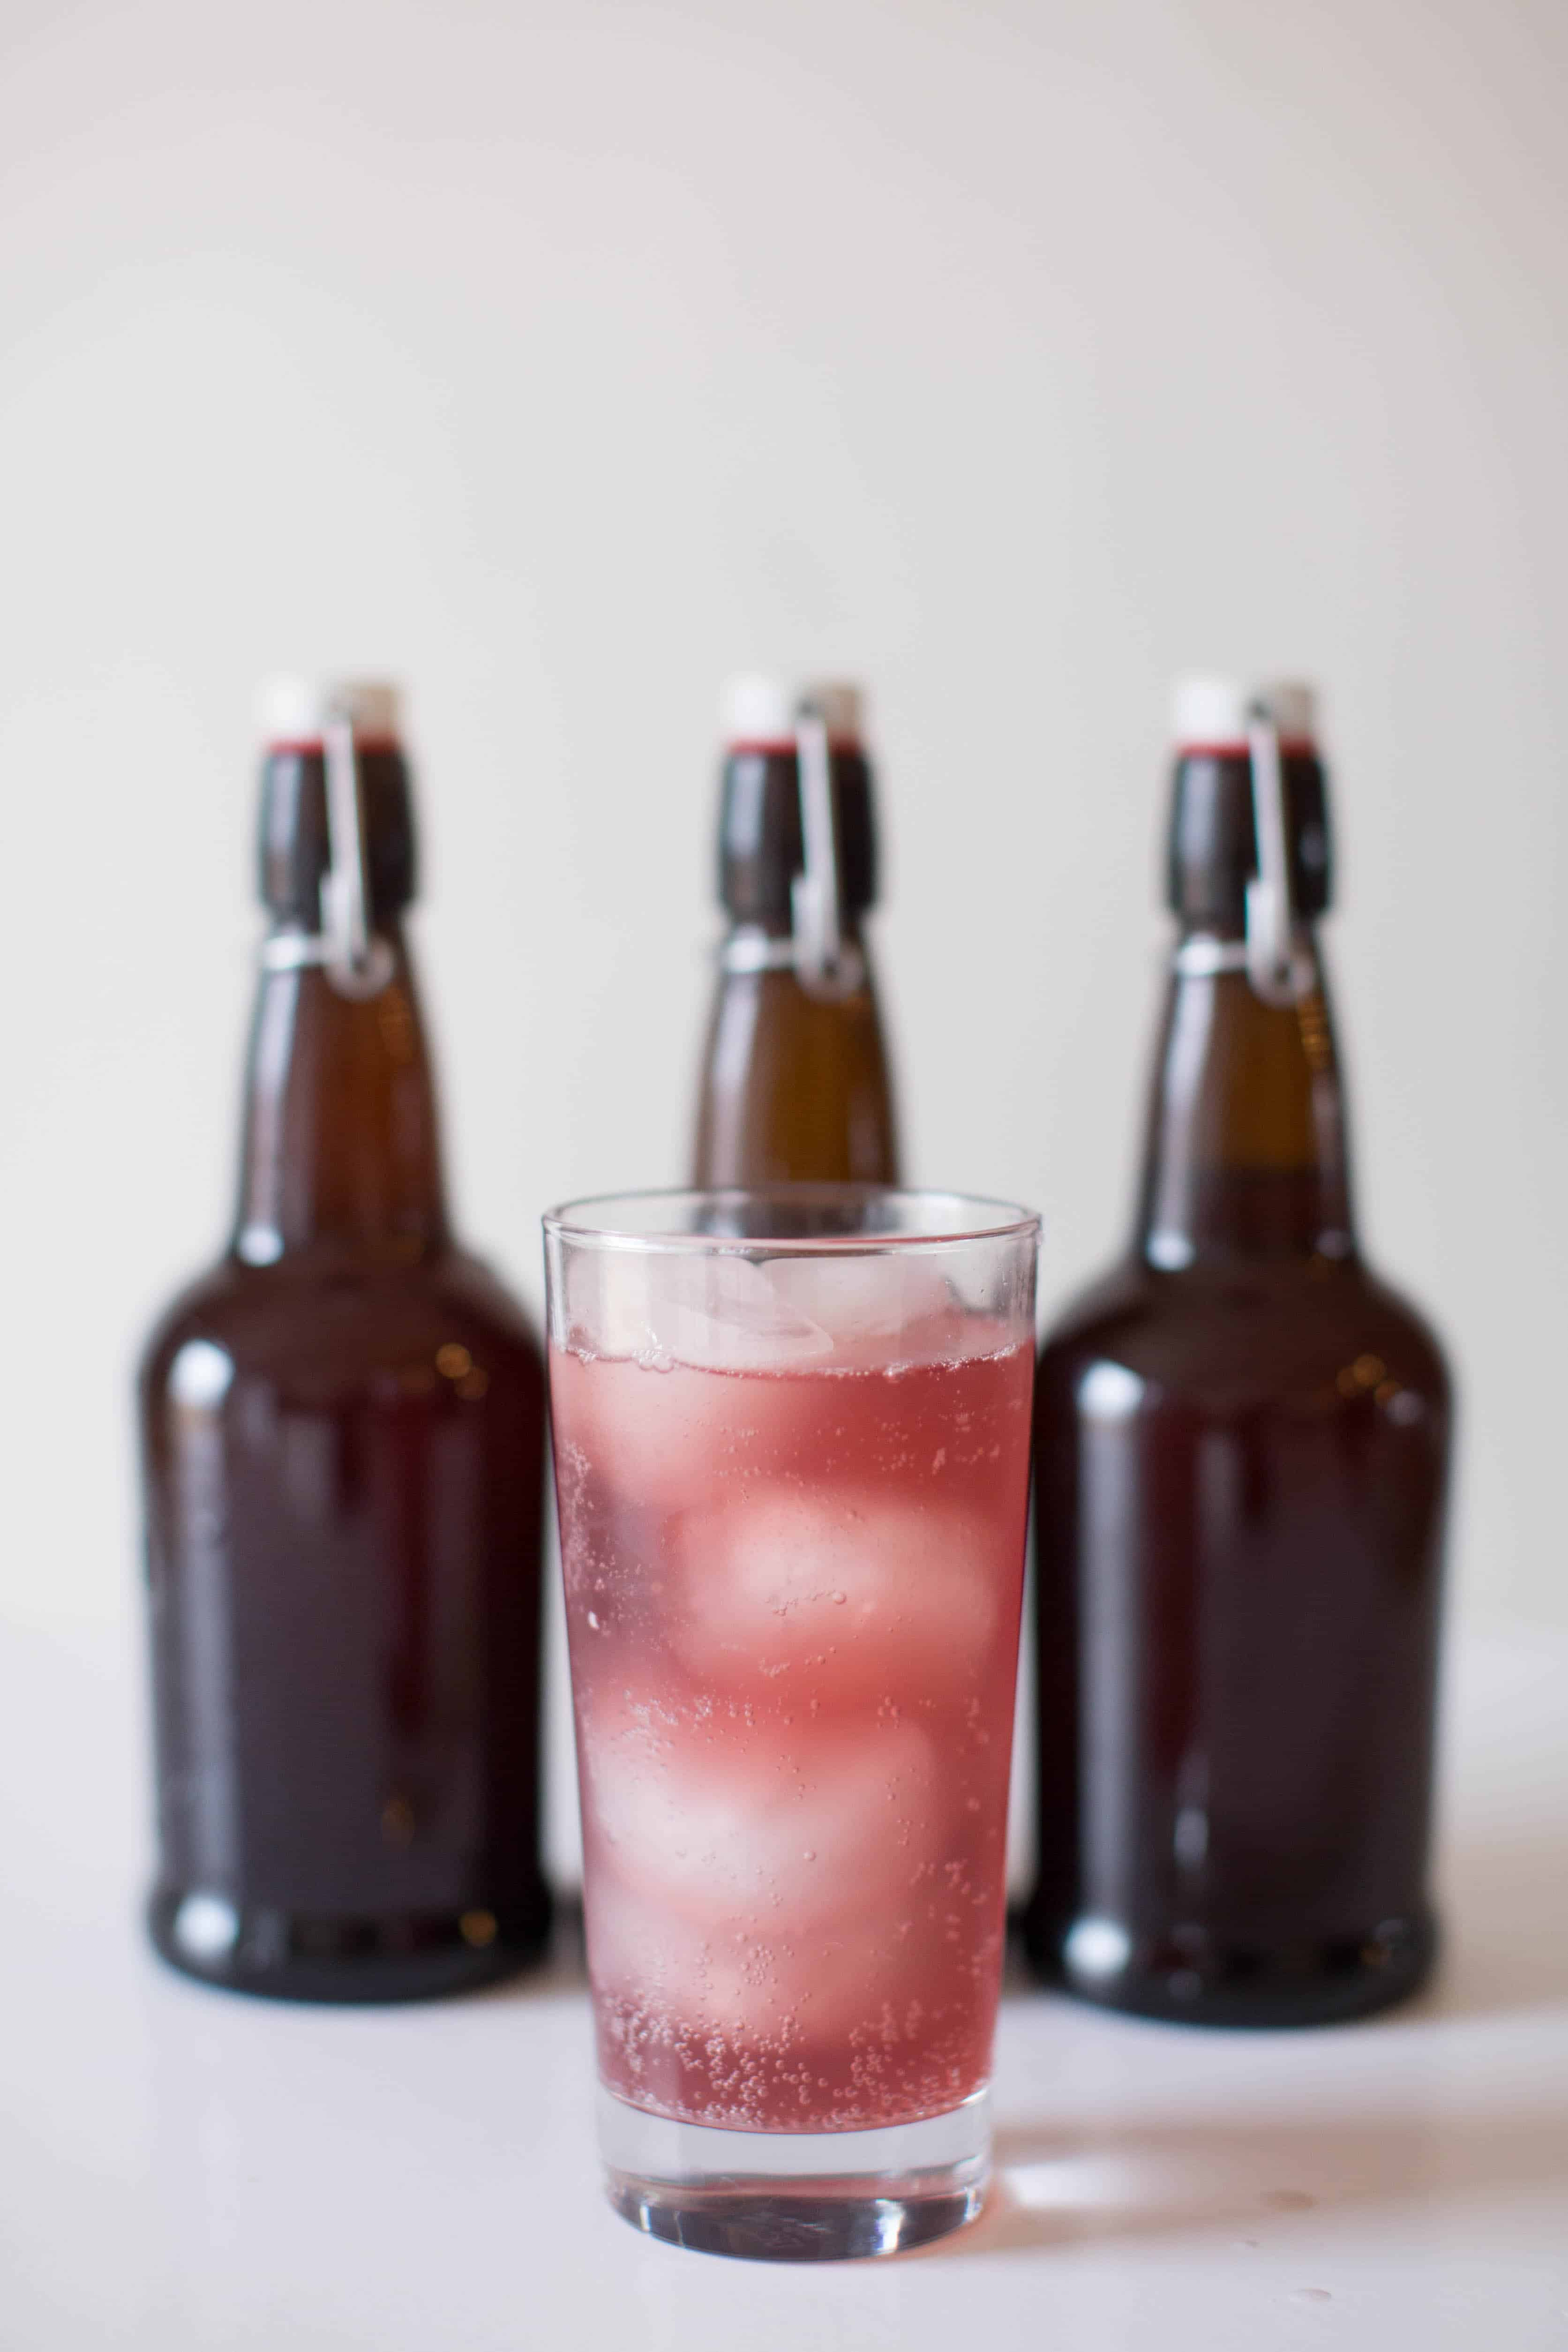 grape water kefir in glass with brown flip top soda bottles in back